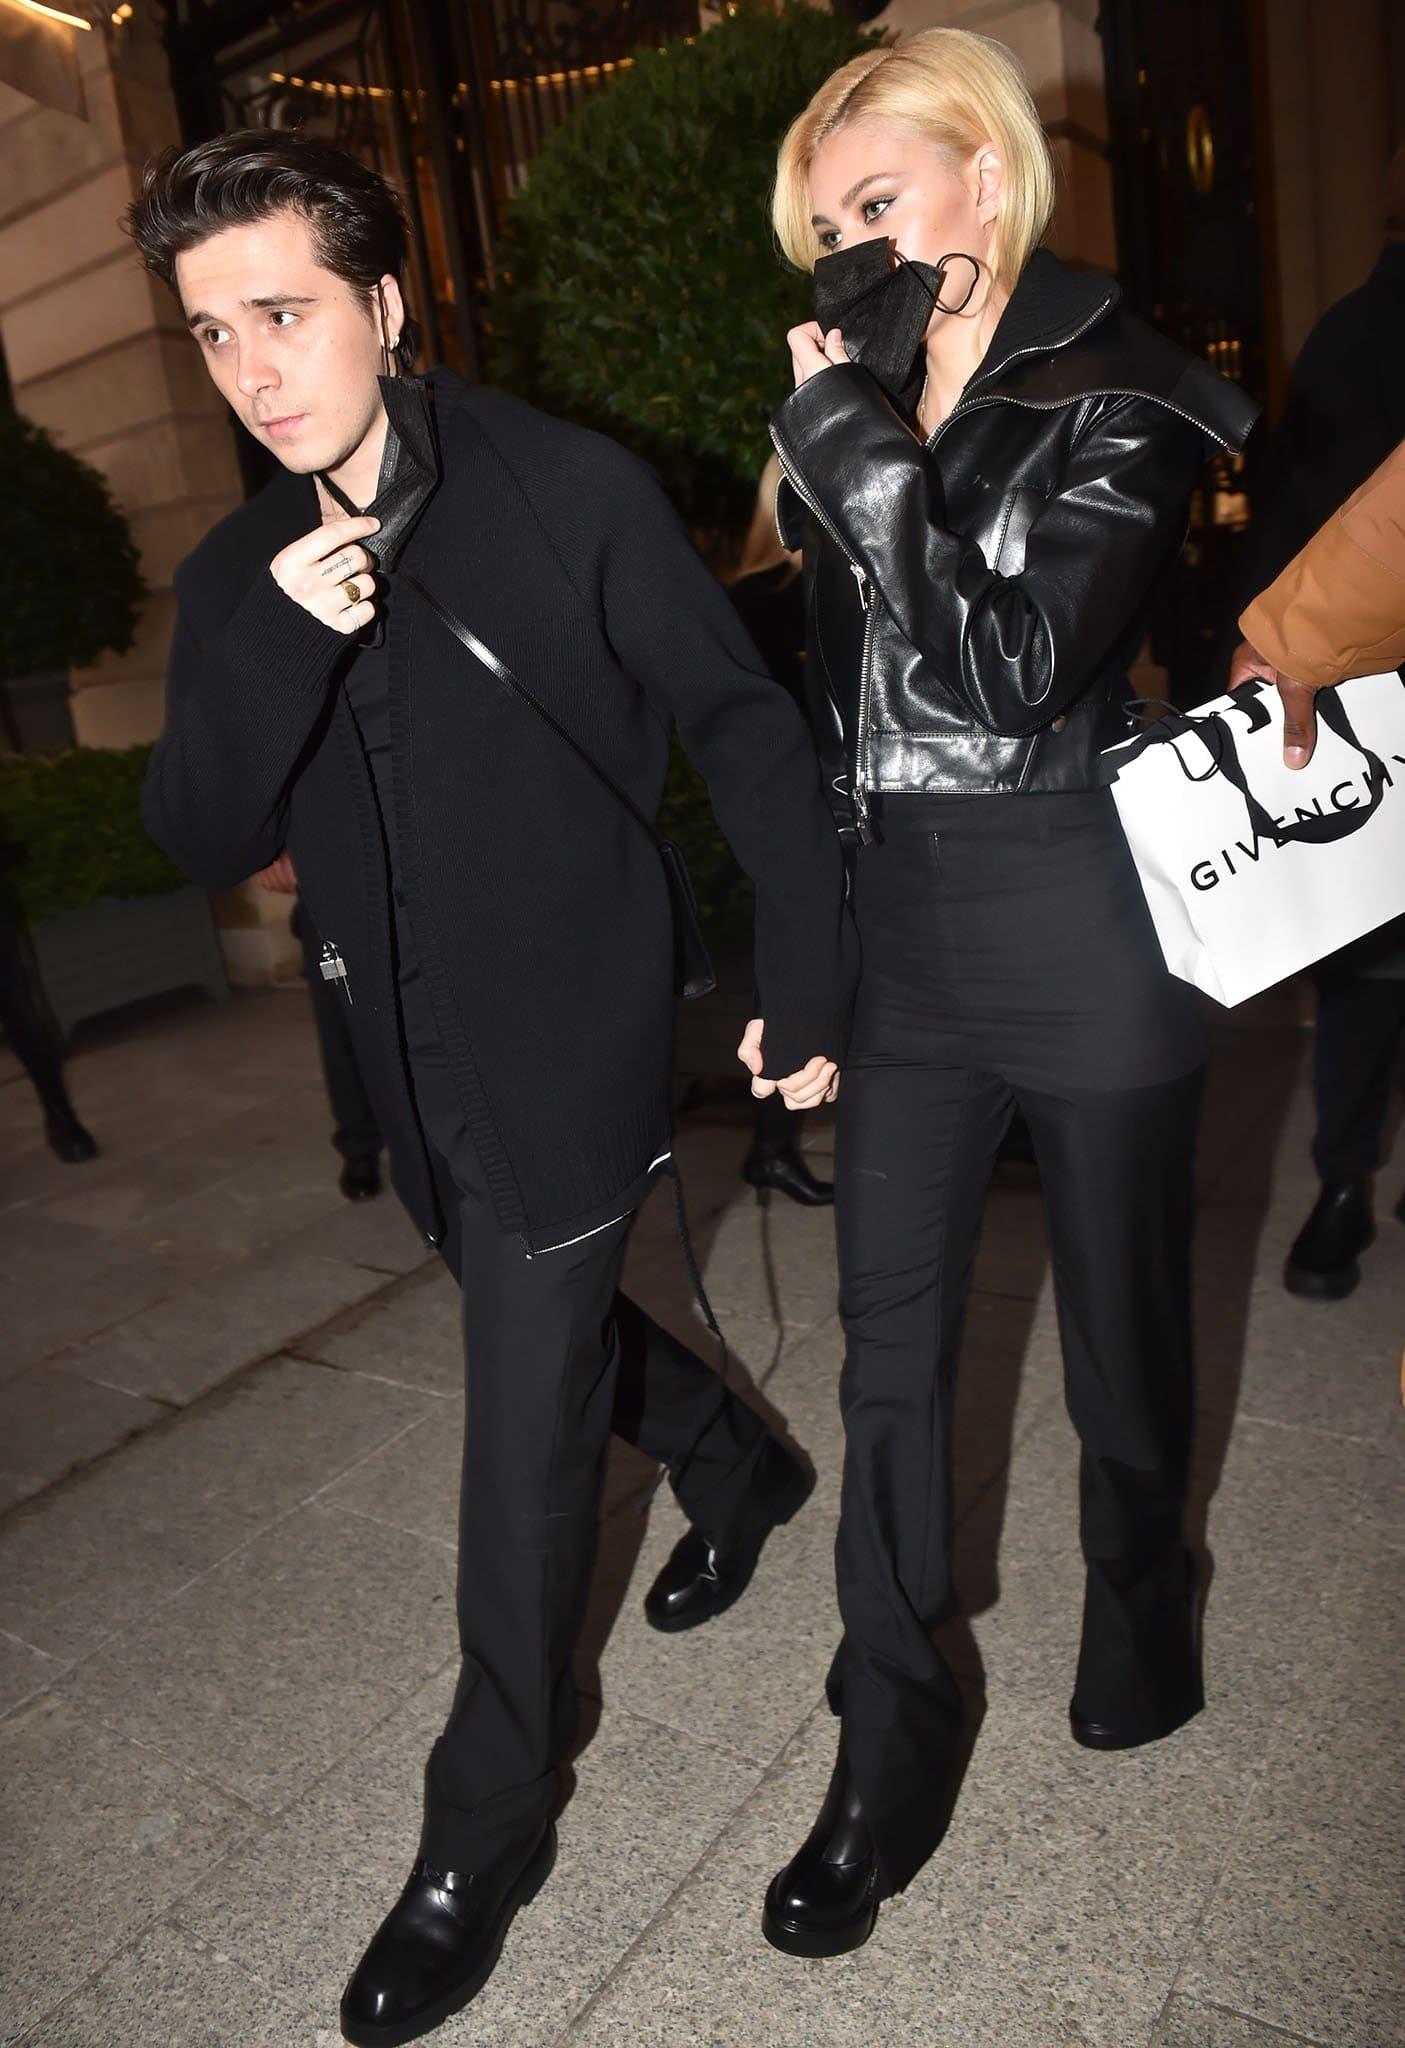 Brooklyn Beckham and Nicola Peltz wear coordinating black looks, with Nicola in a black leather biker jacket and Brooklyn in a rib-knit cardigan